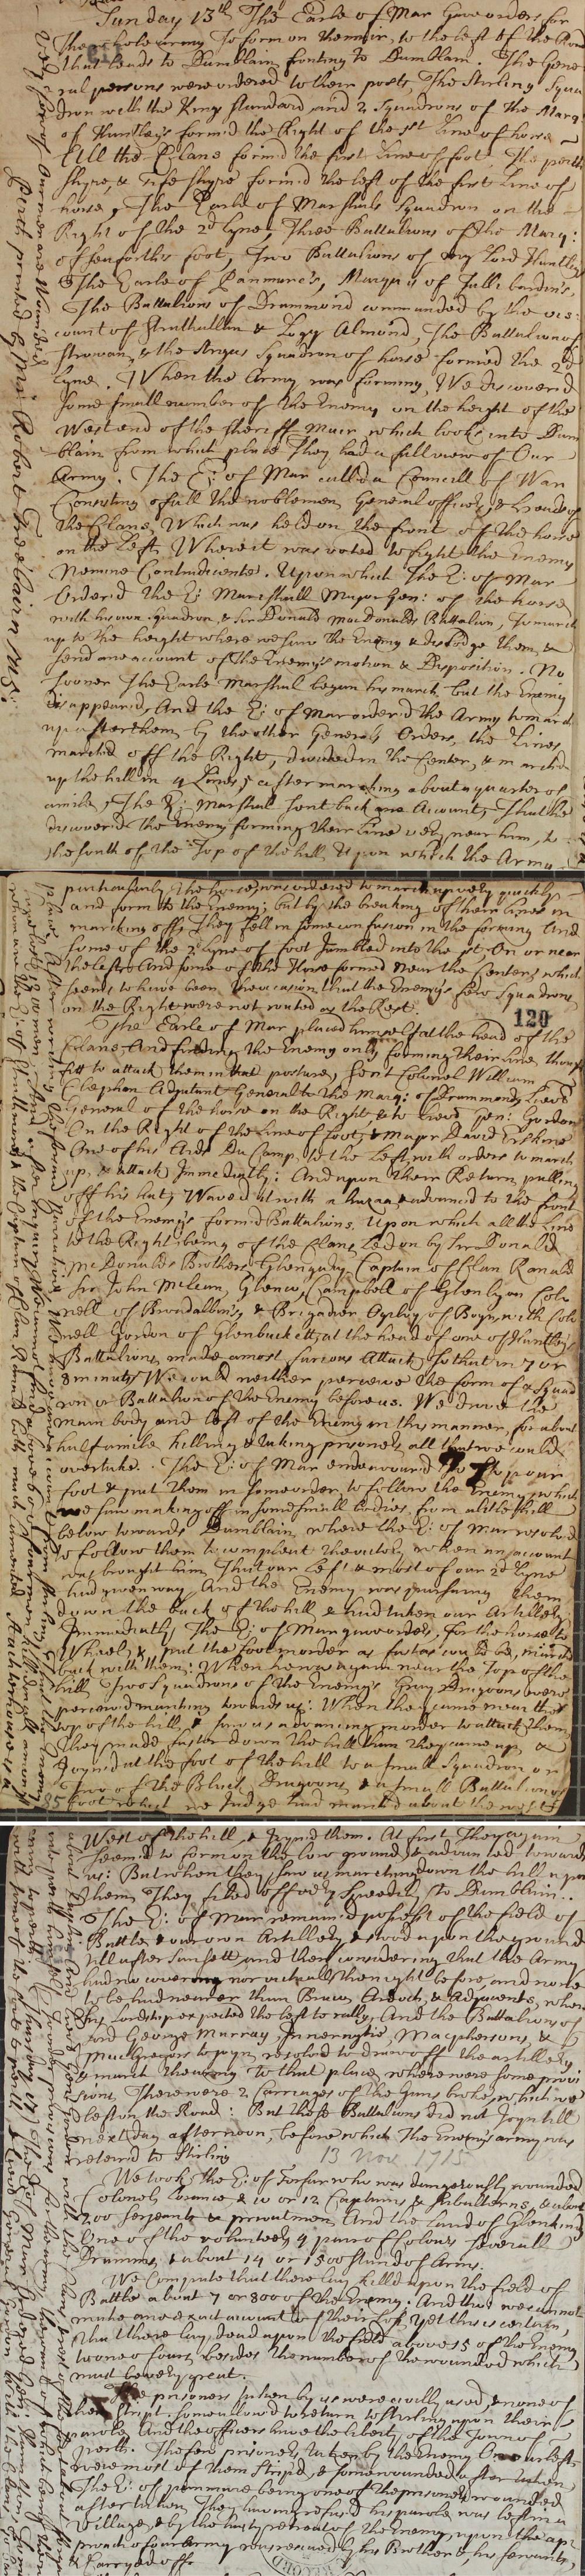 Account of Sherrifmuir, 13 November 1715 (SP 54/10/45B)